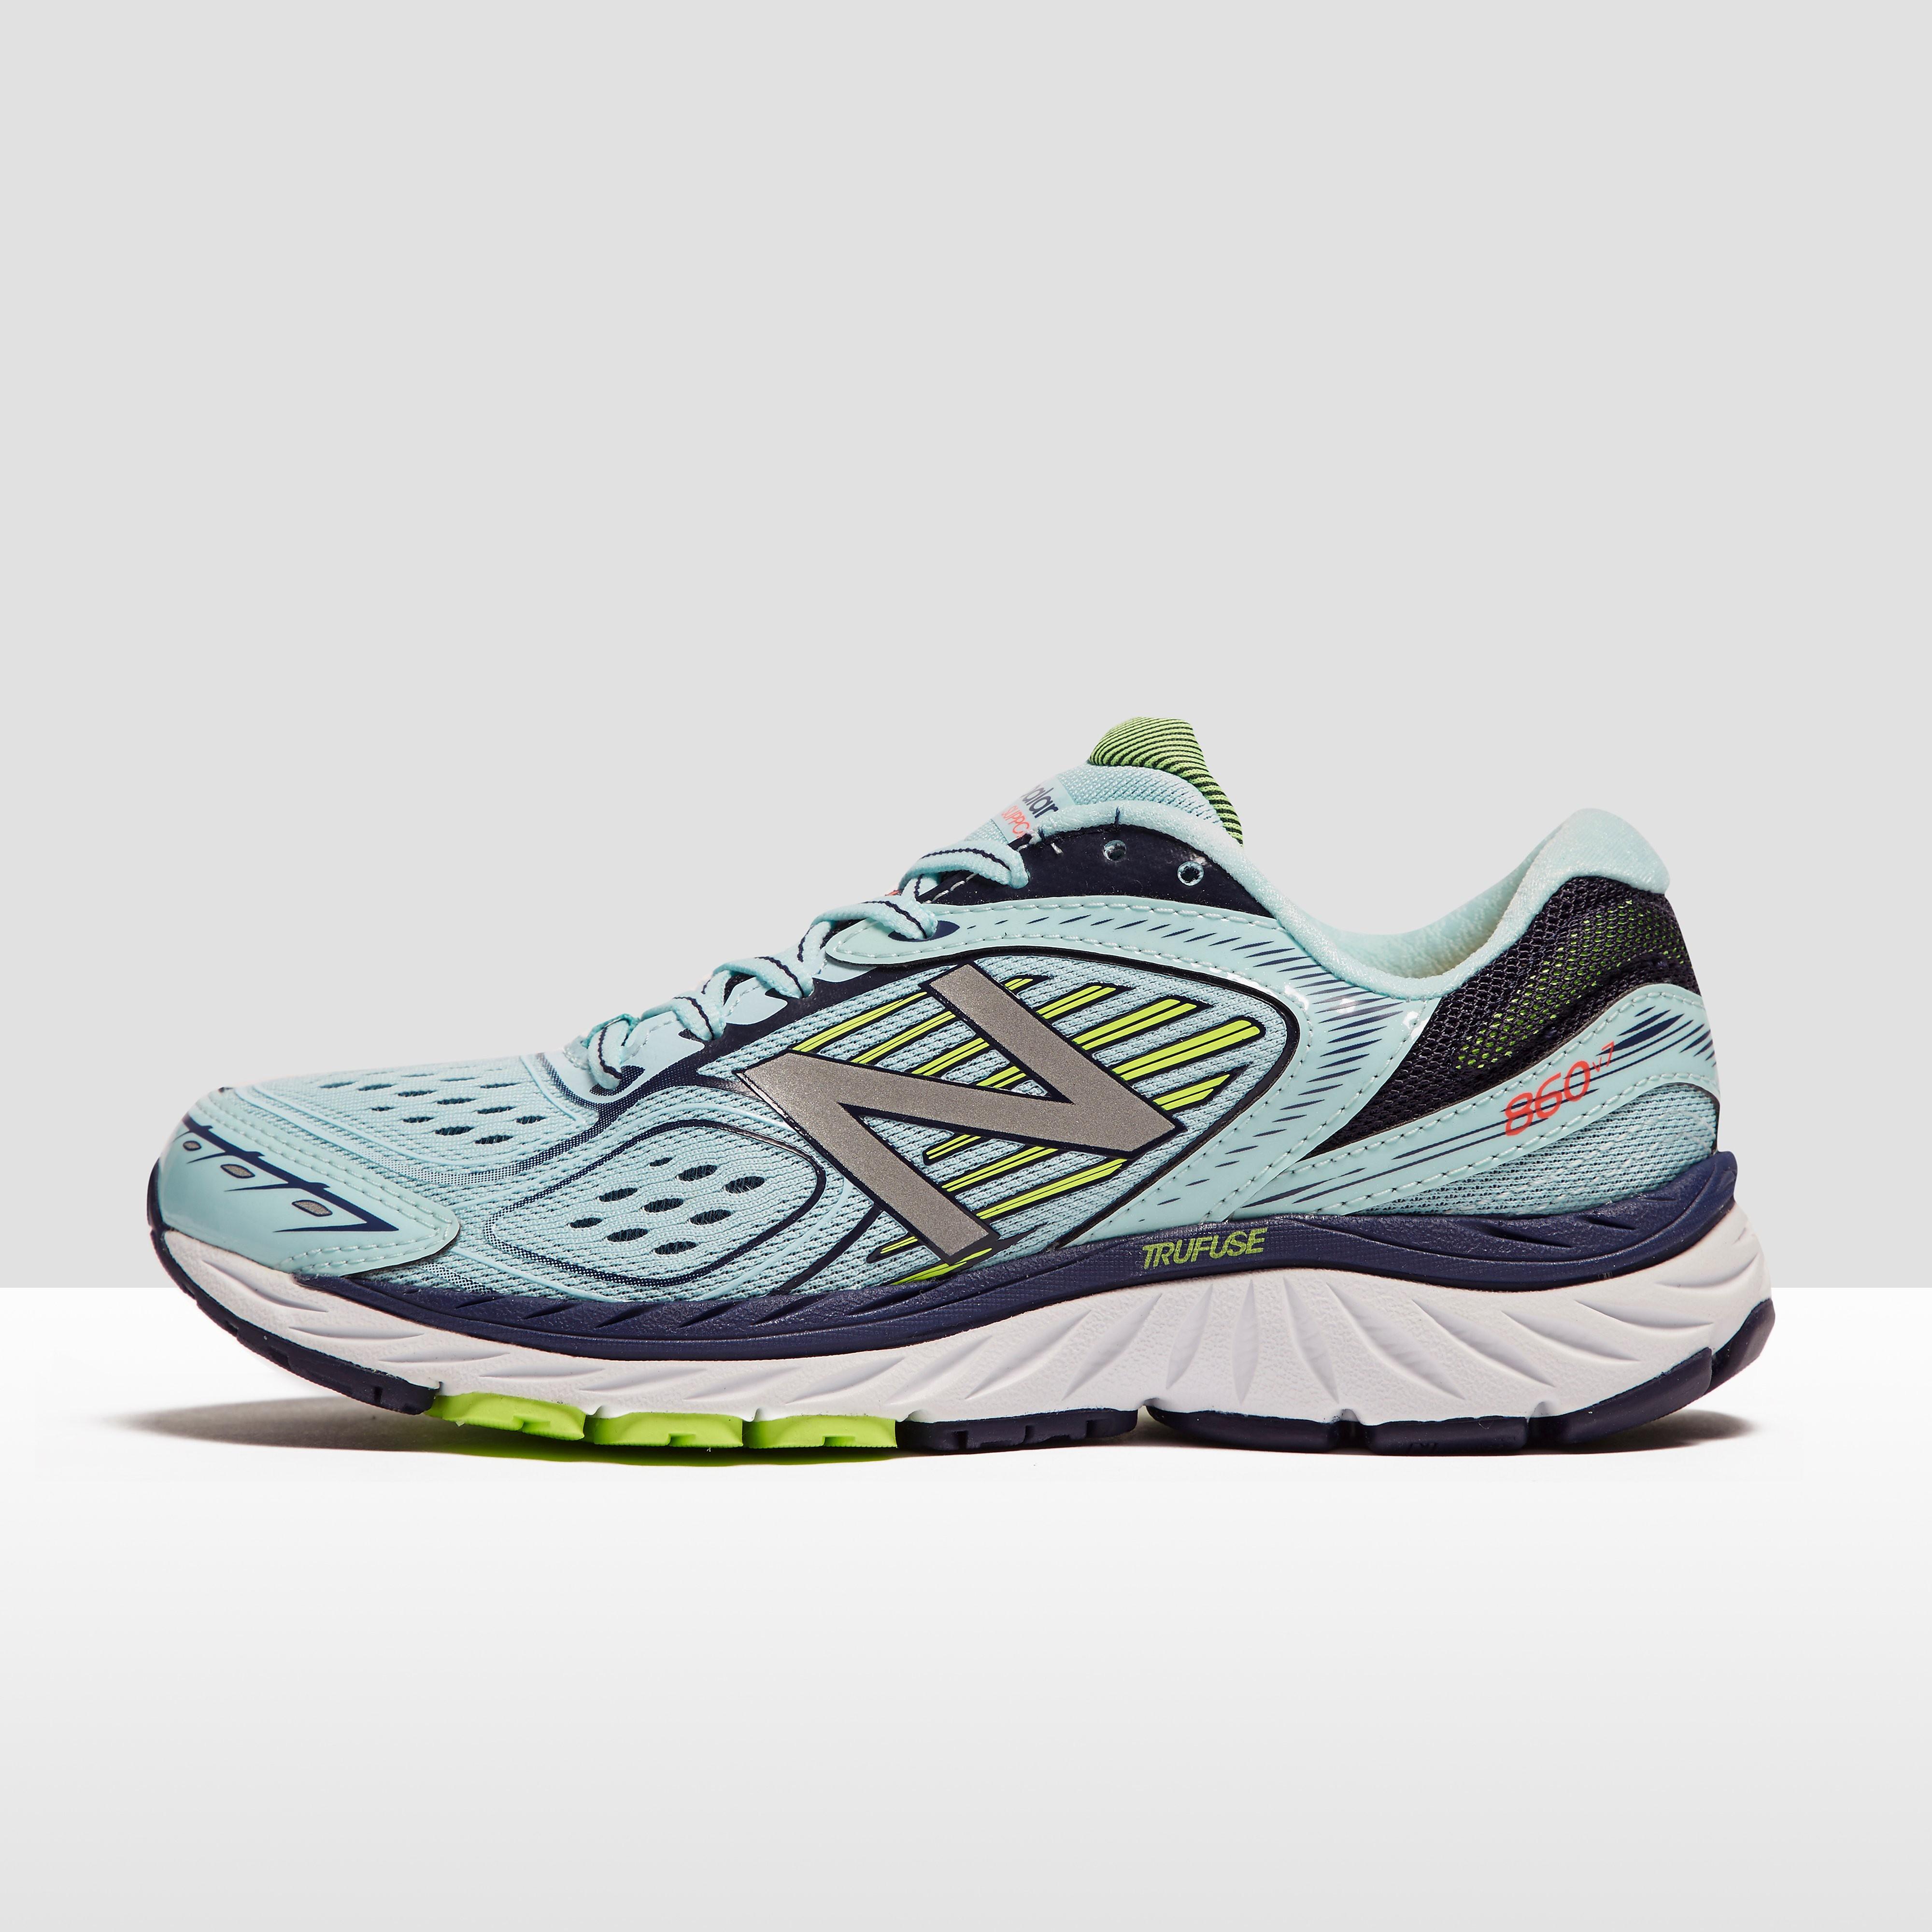 New Balance 860V7 Women's Running Shoes